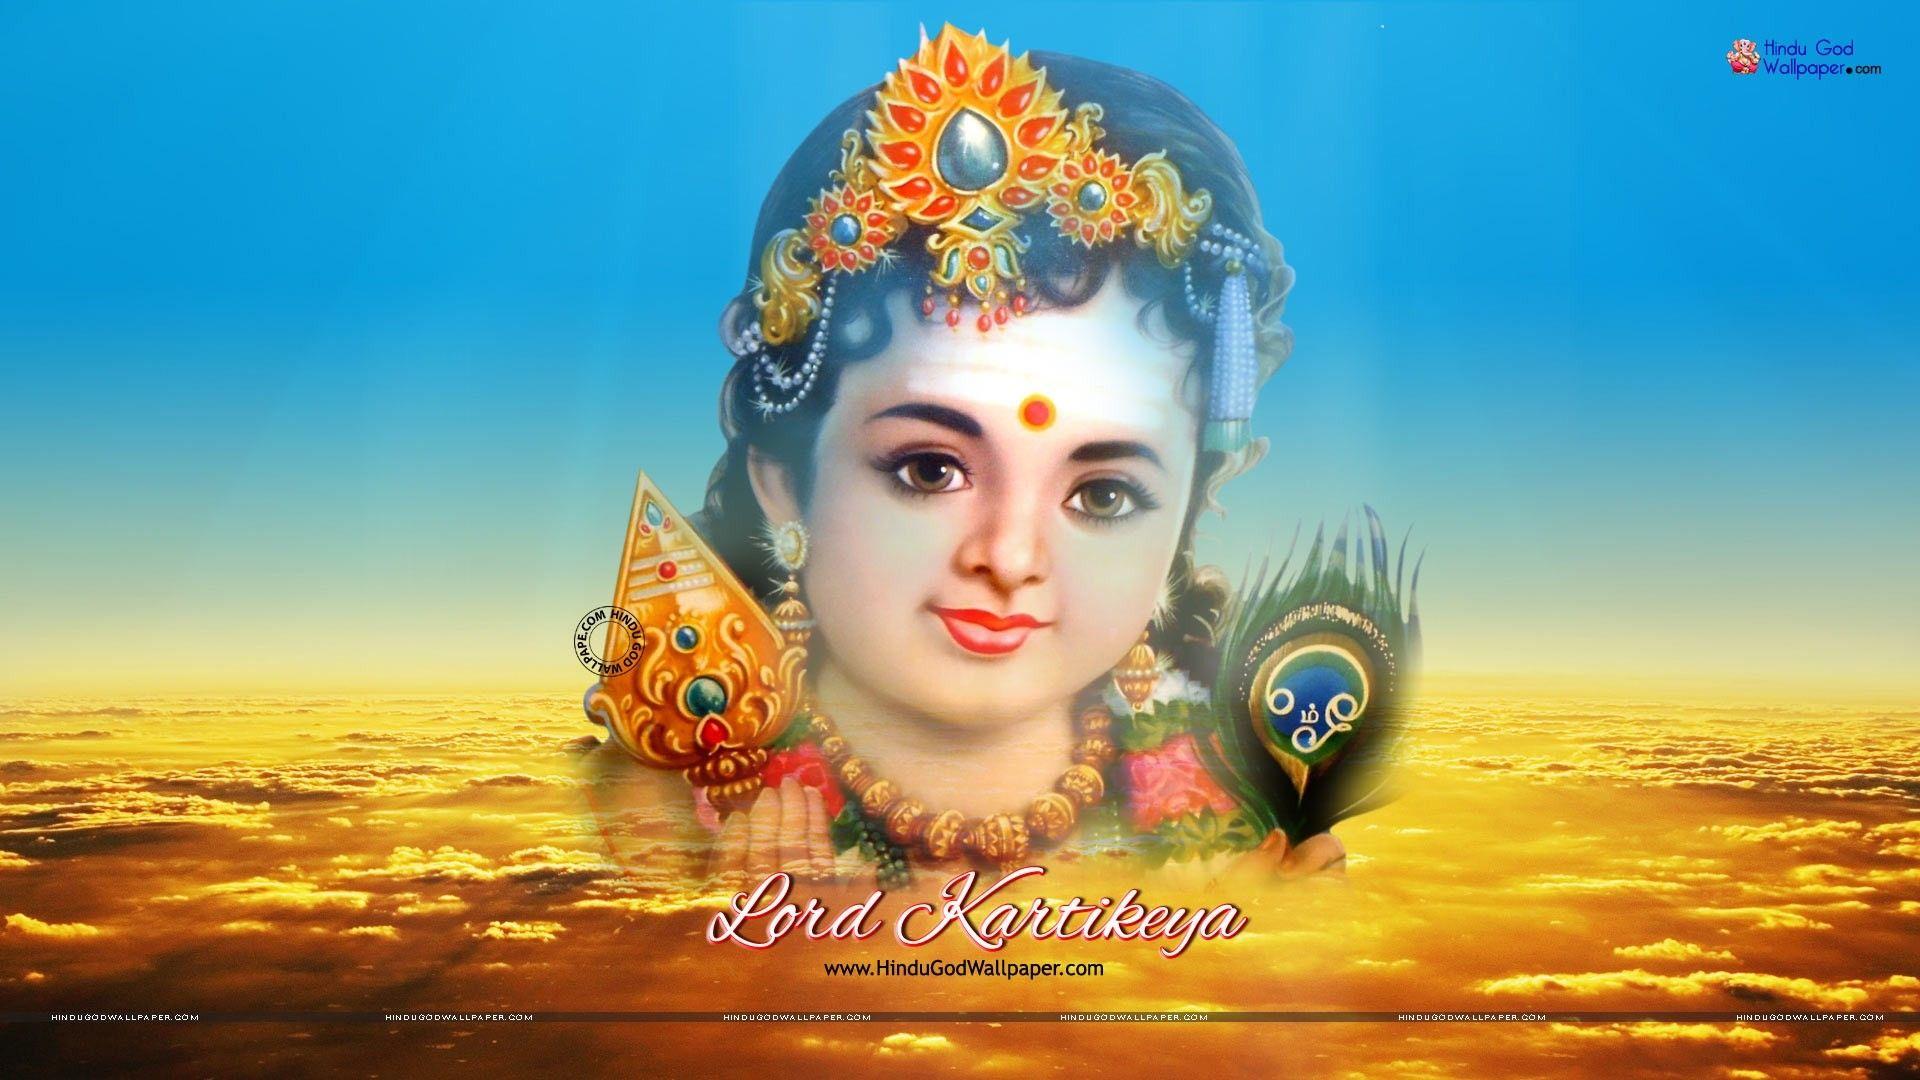 1920x1080 god murugan hd wallpapers 1080p hd wallpapers 1080p hindu gods lord murugan wallpapers 1920x1080 god murugan hd wallpapers